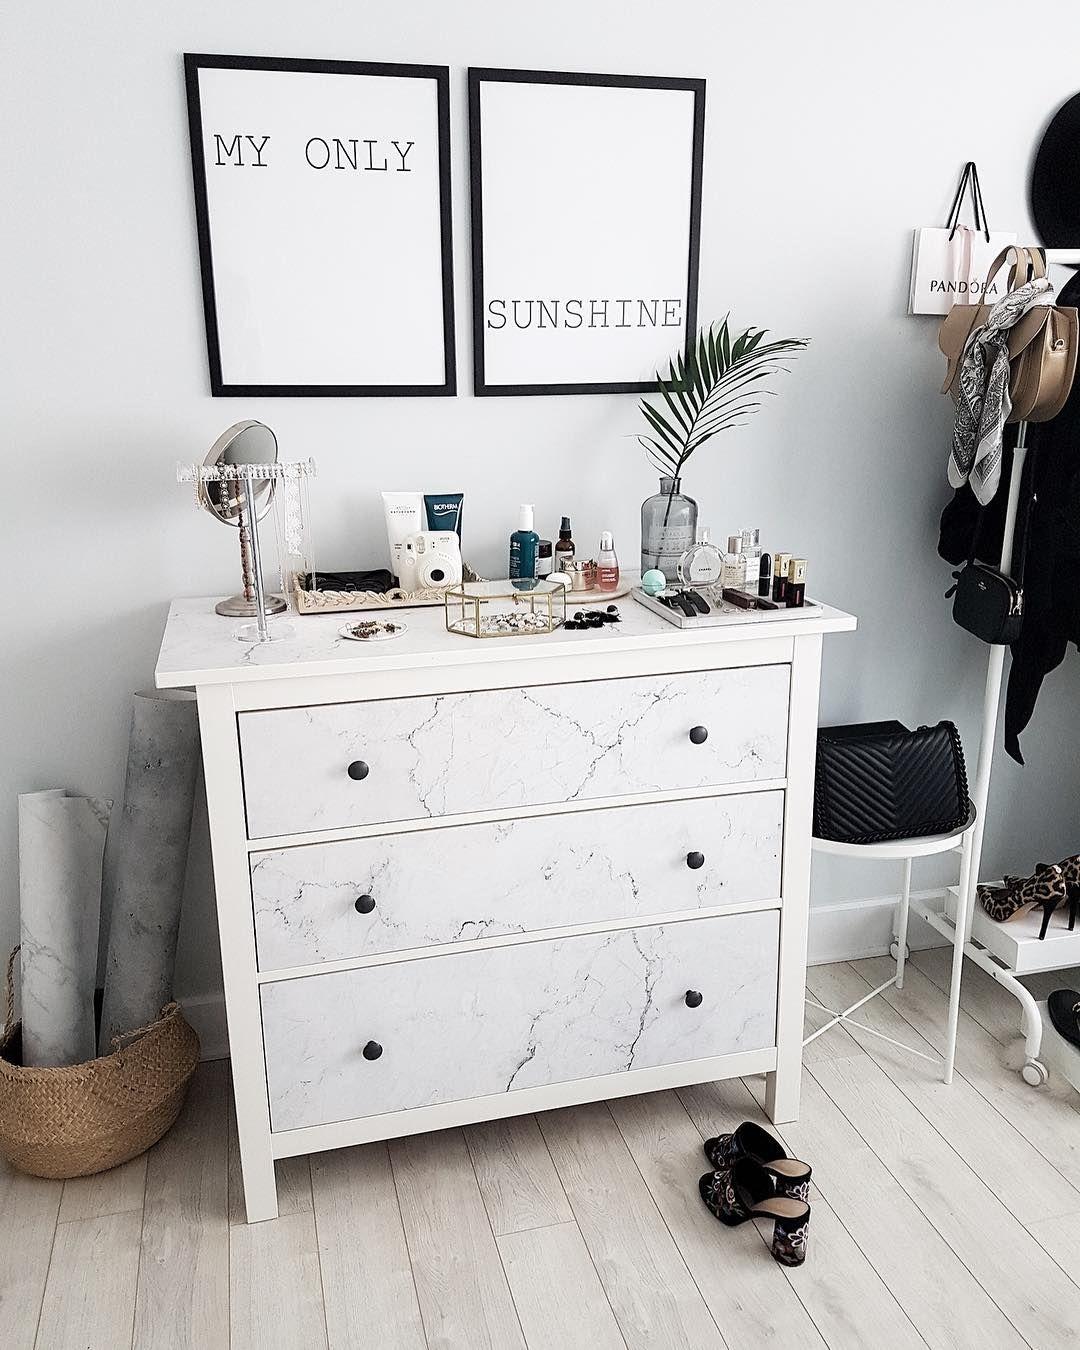 Diy Ikea Hemnes Dresser Makover With Self Adhesive Marble